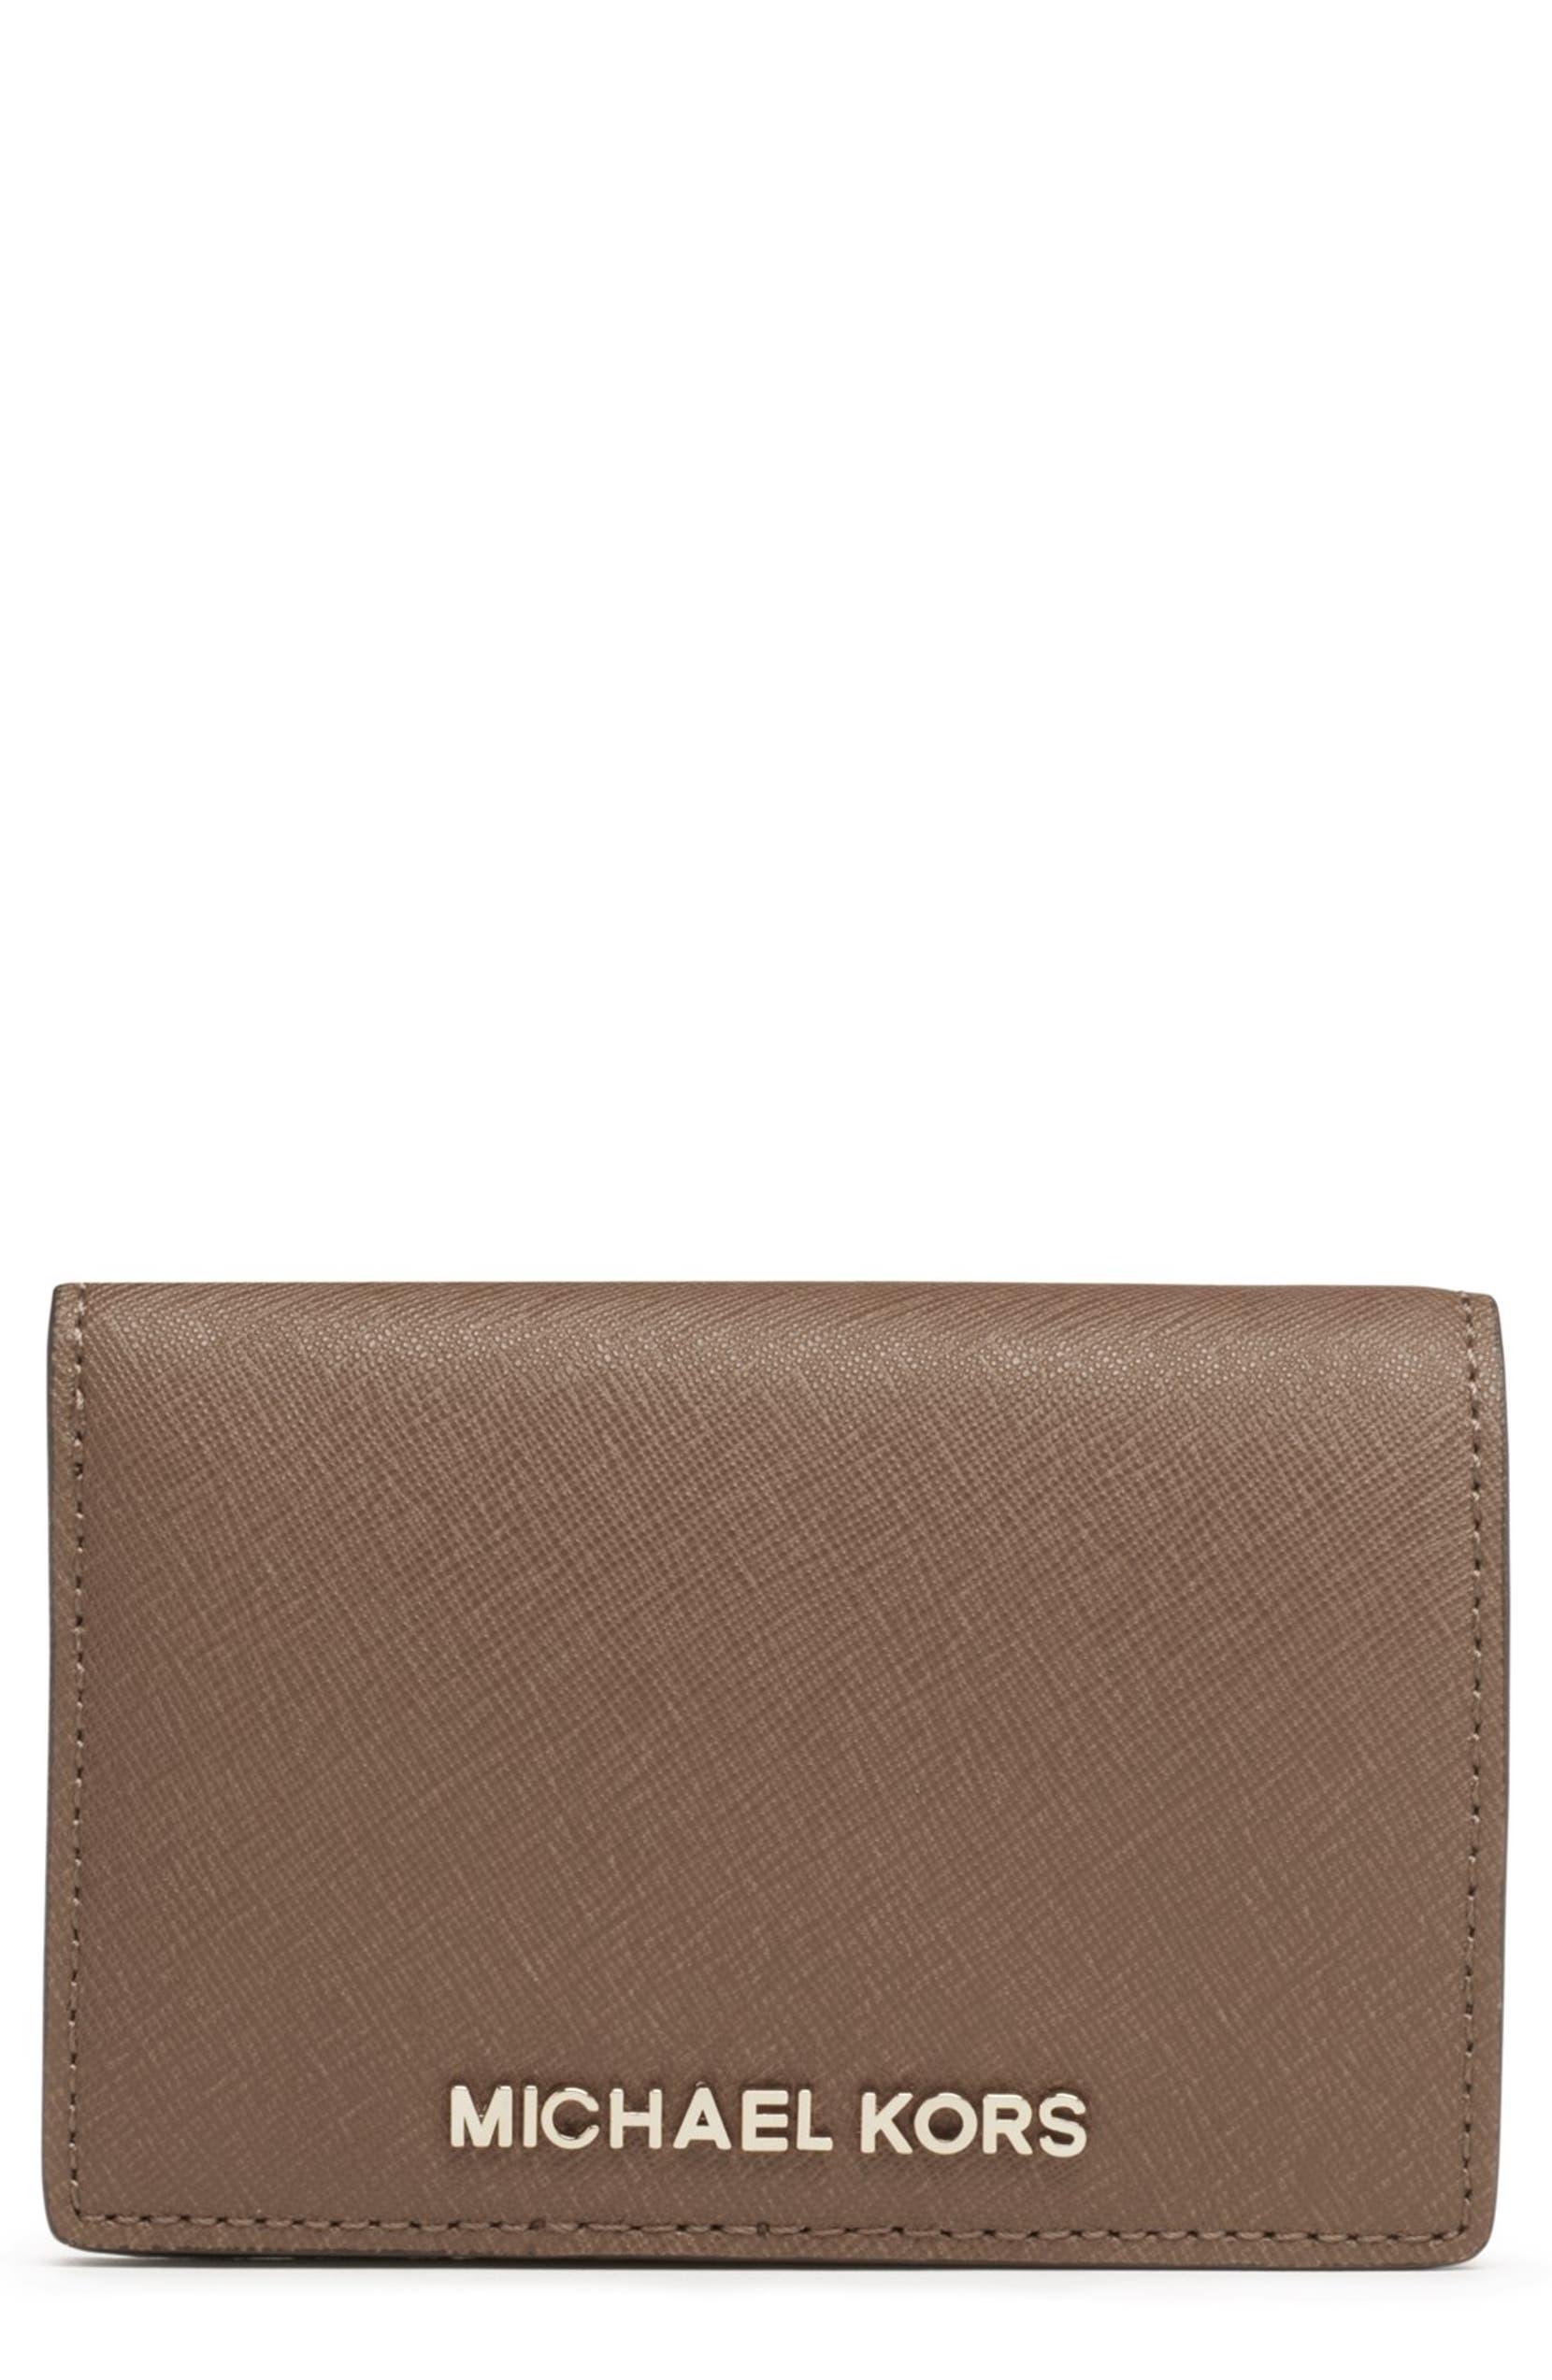 31bf8fa1b72 MICHAEL Michael Kors 'Jet Set - Slim' Saffiano Leather Wallet | Nordstrom